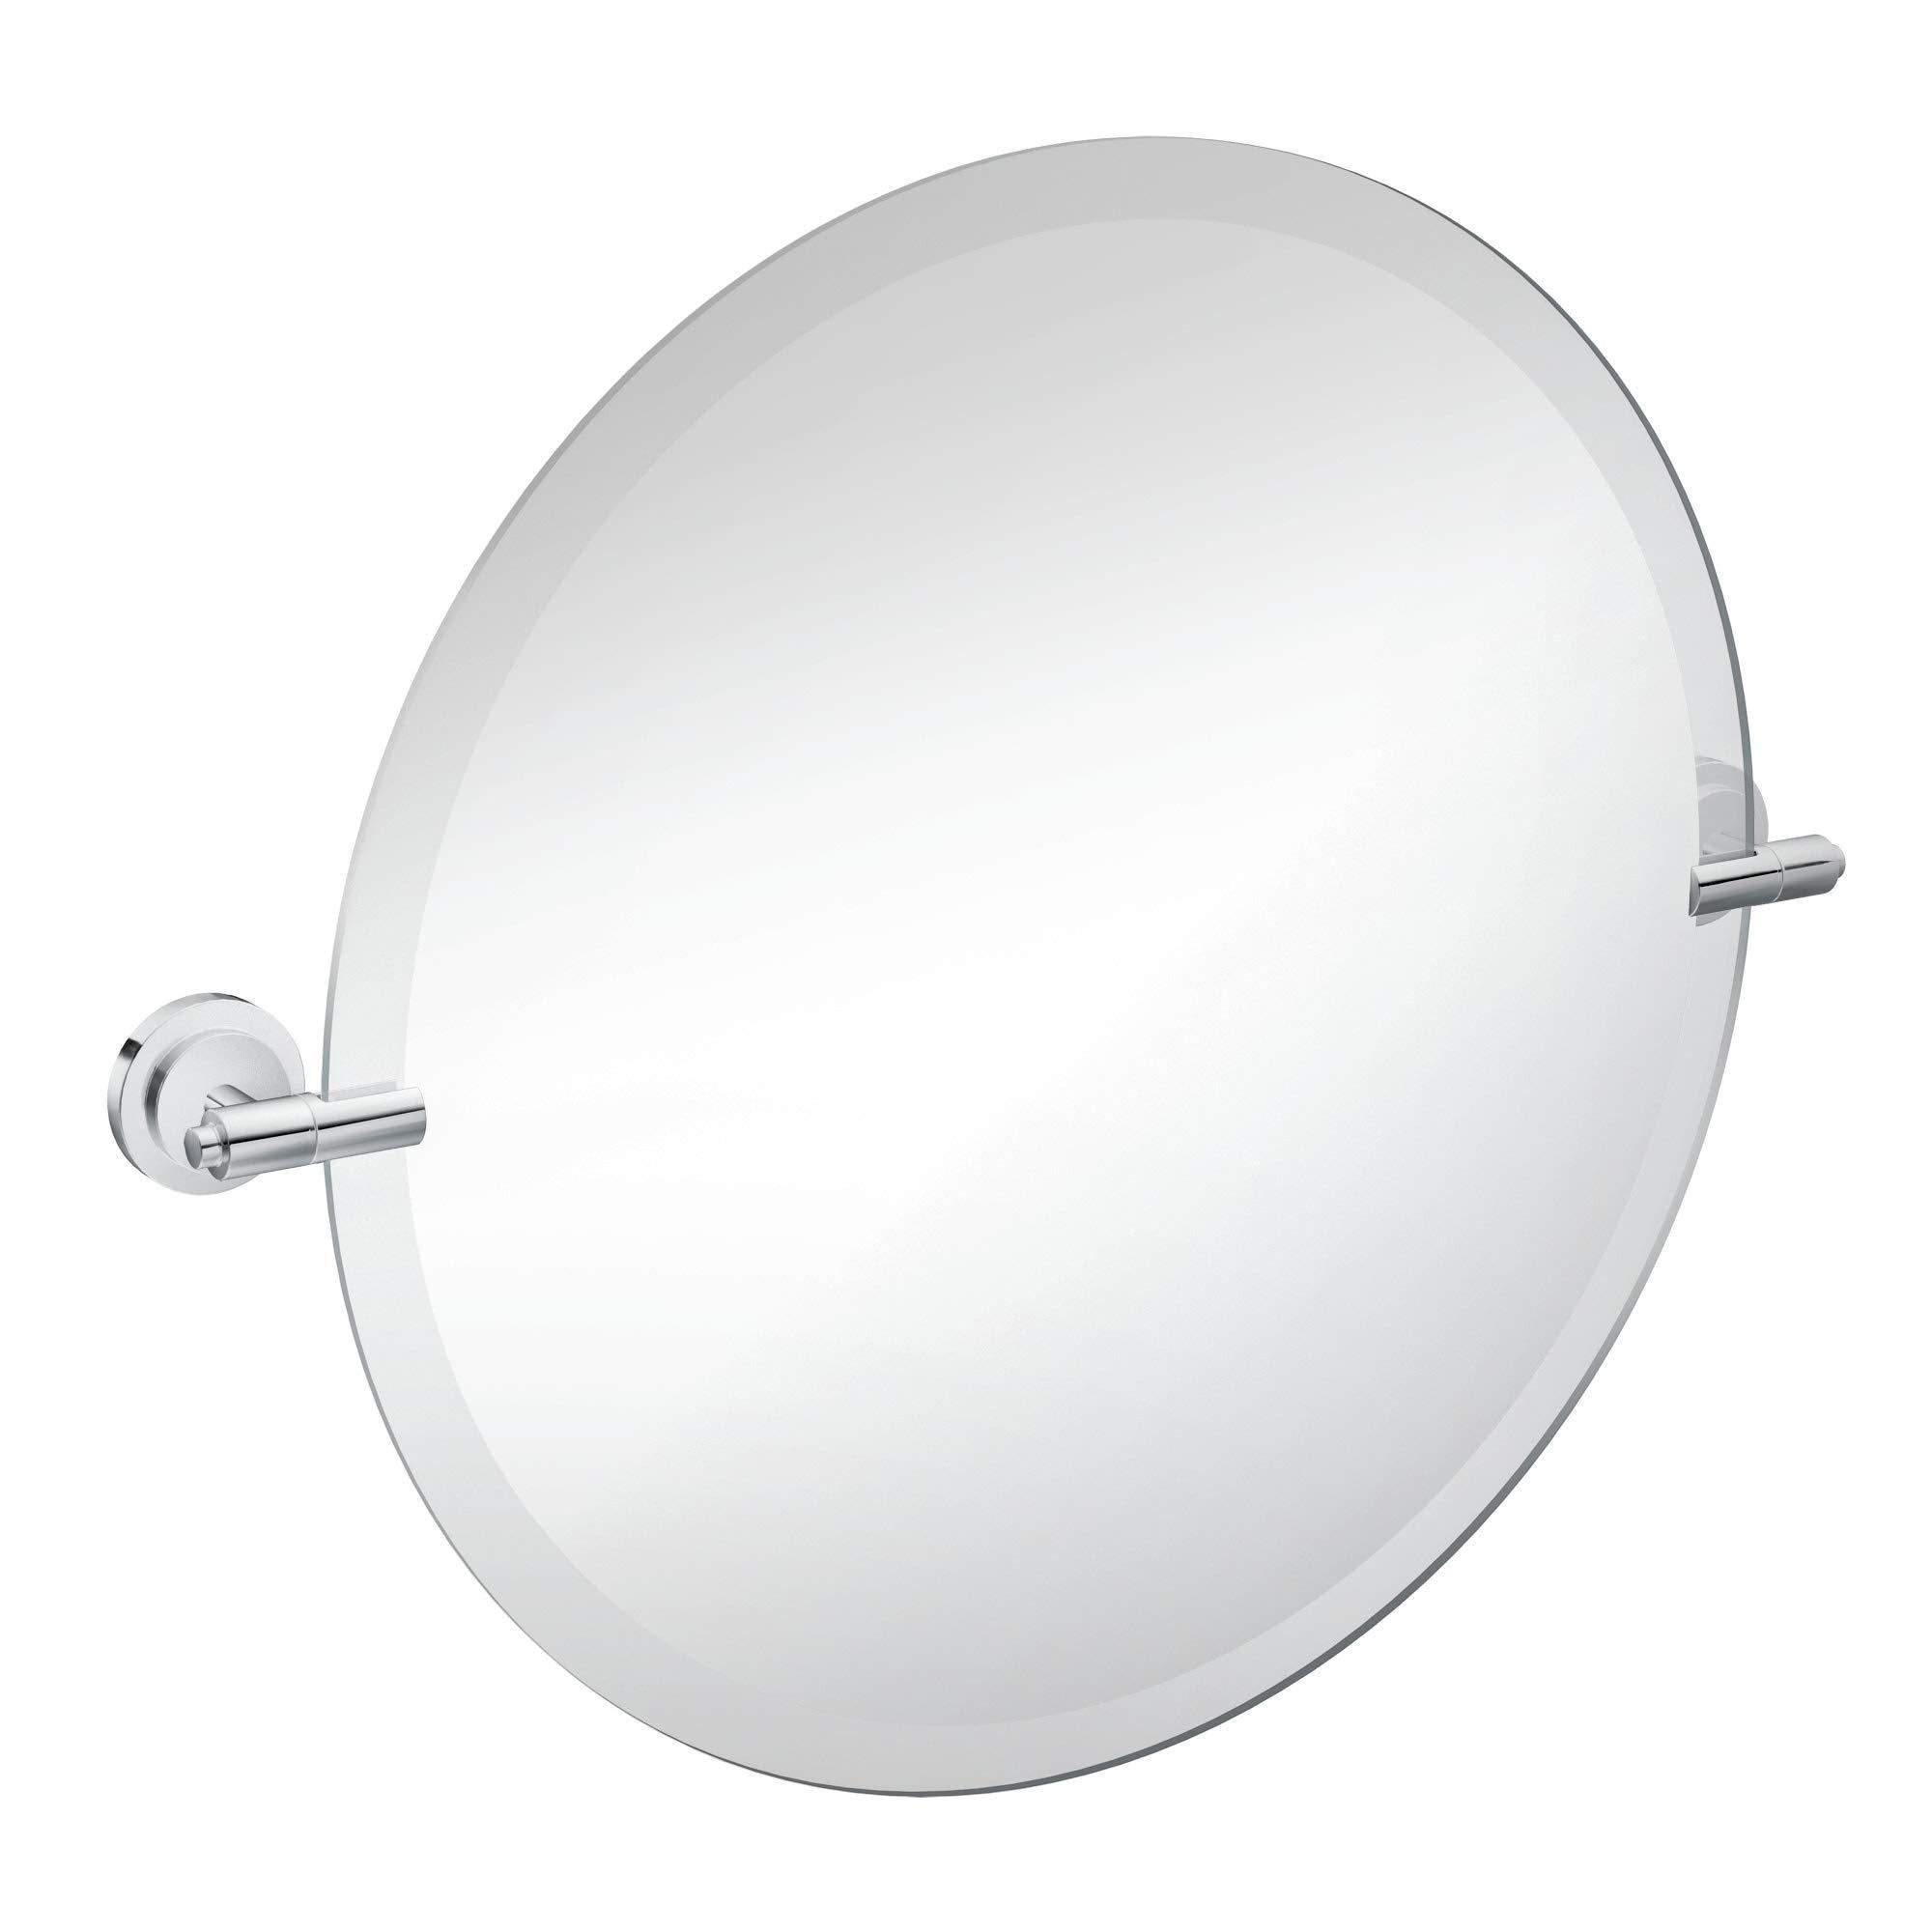 Moen DN0792CH Iso 22-Inch x 22-Inch Frameless Pivoting Bathroom Tilting Mirror, Chrome